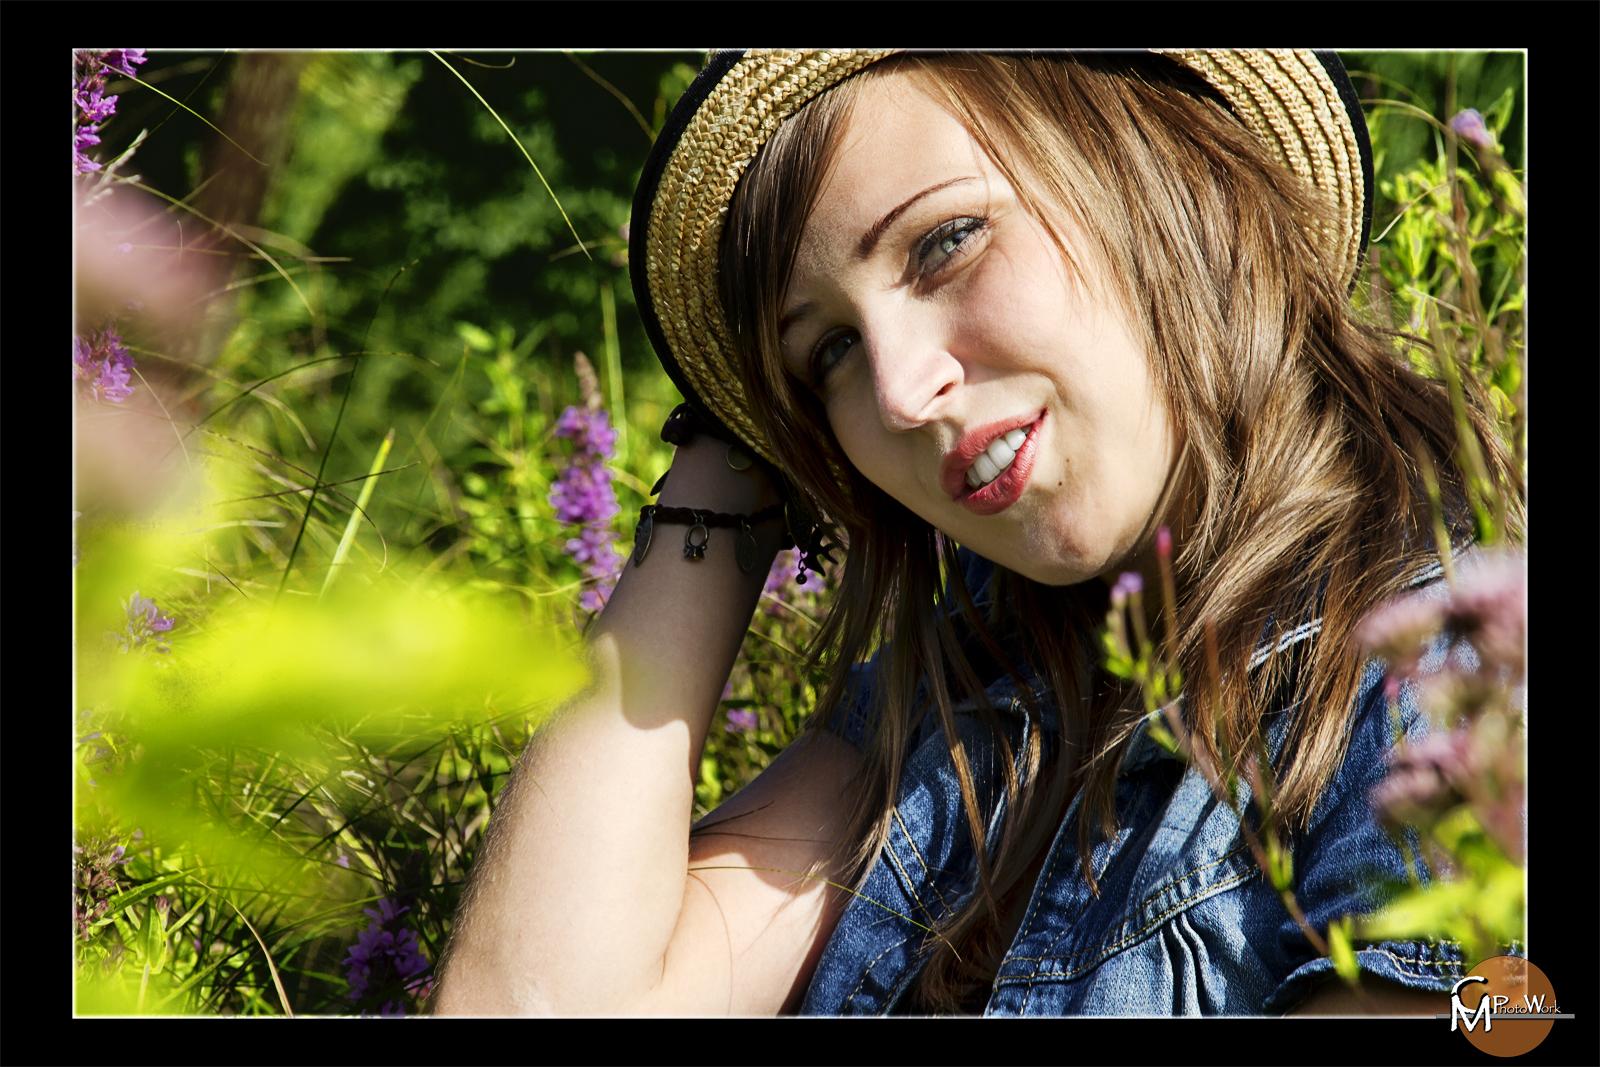 Catharina mit Hut